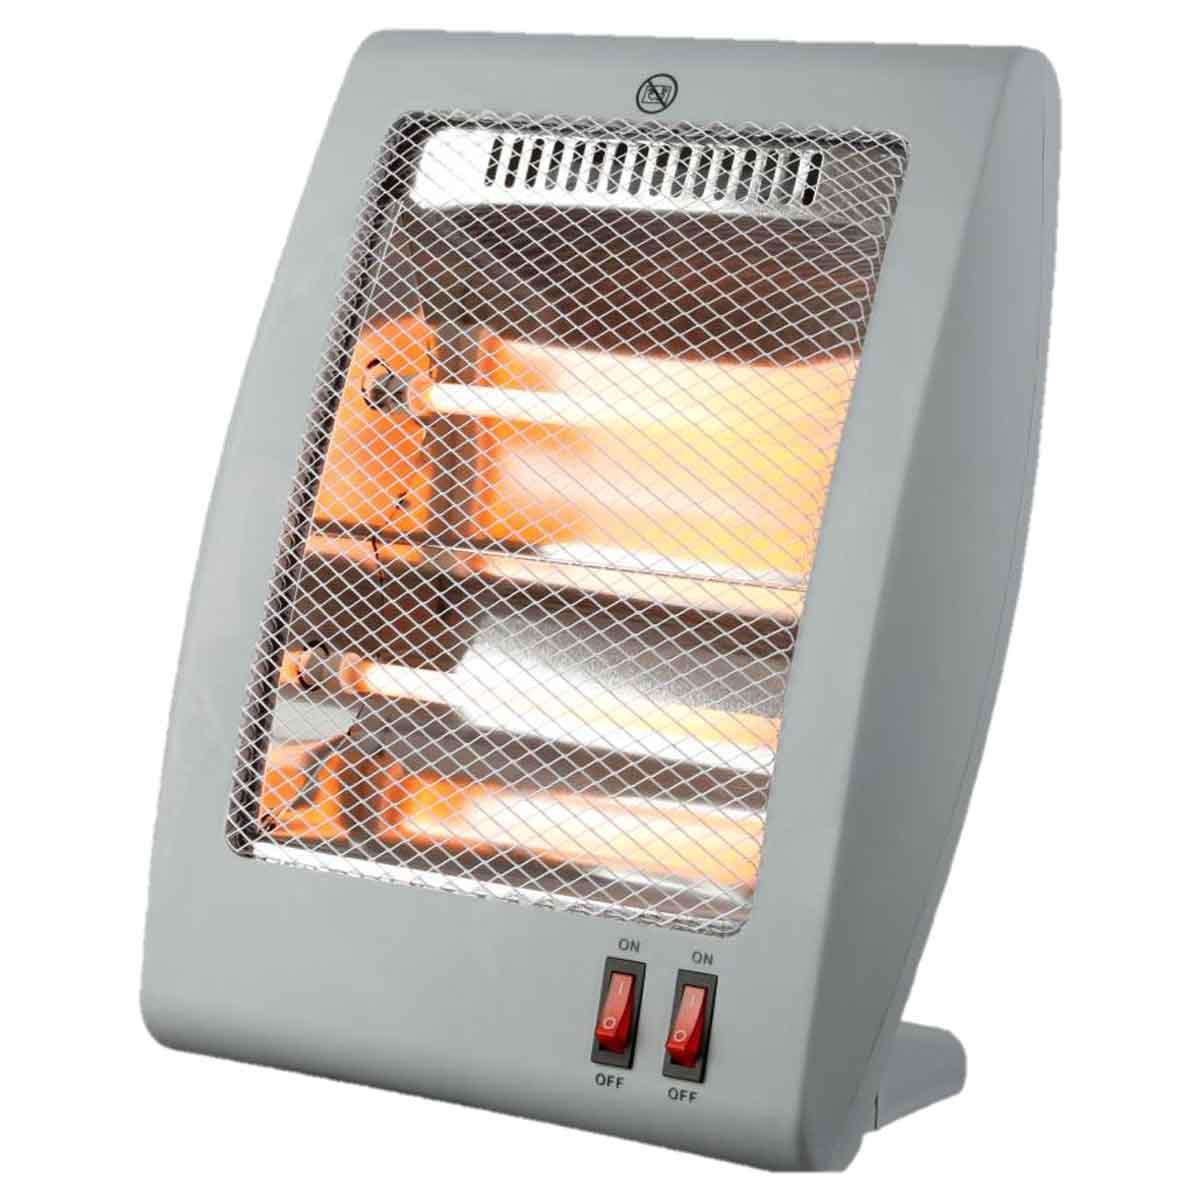 Calefactor Calentador Electrico Cuarzo 2 Niveles 120 V Helio